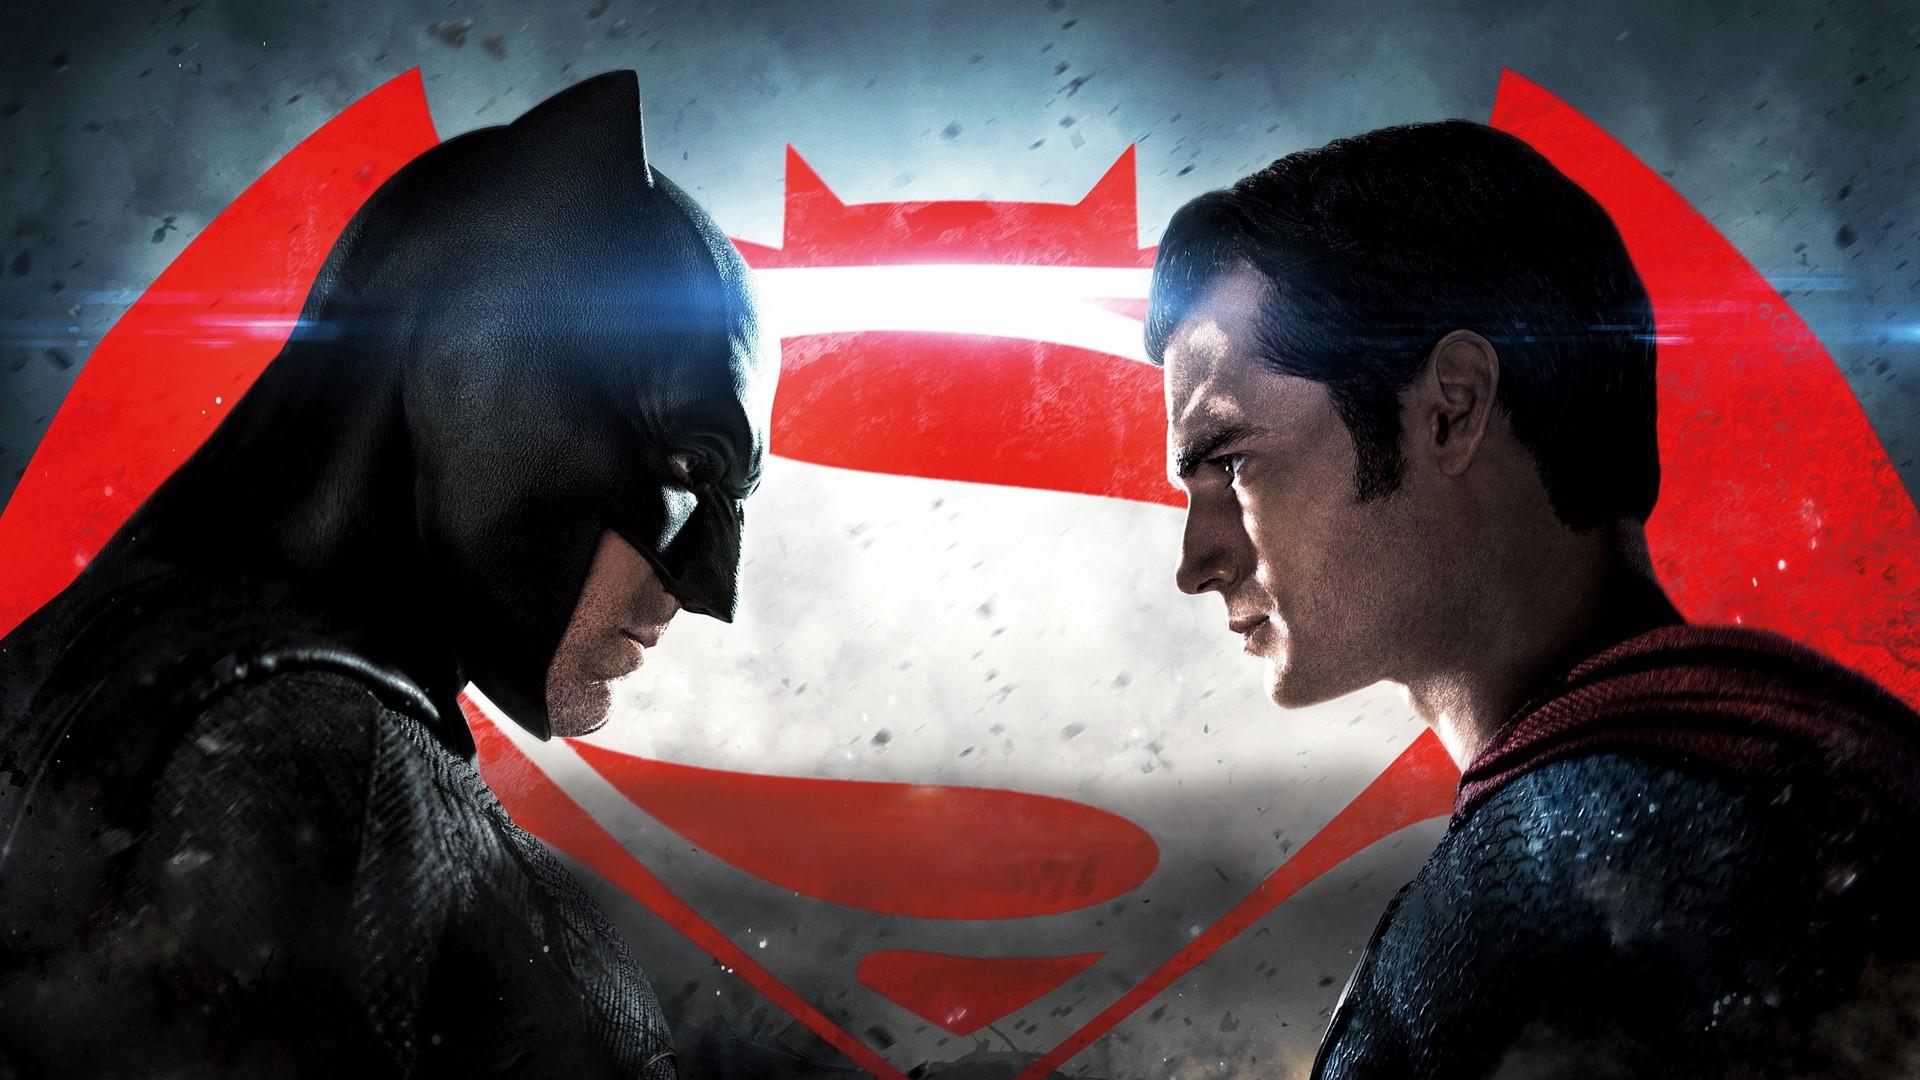 Star Wars, Superman vs Batman, What Next..?